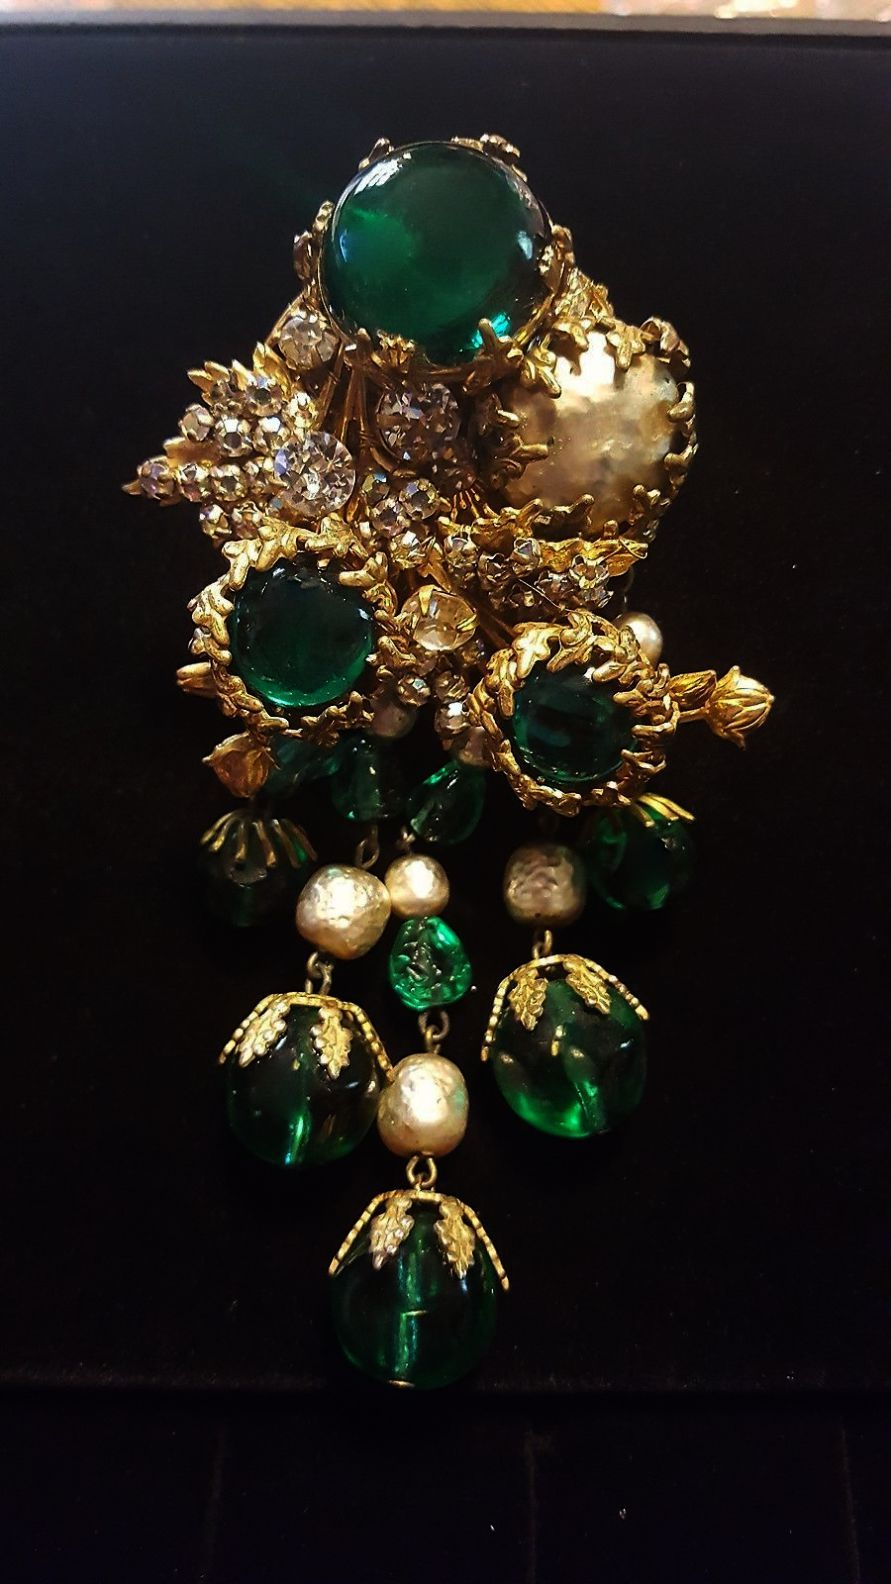 Bed Bath And Beyond Jewelry Box : beyond, jewelry, Jewellery, Stores, Orillia, Jewellery,, Beyond, Honey, Jewelry,, Vintage, Costume, Inexpensive, Jewelry